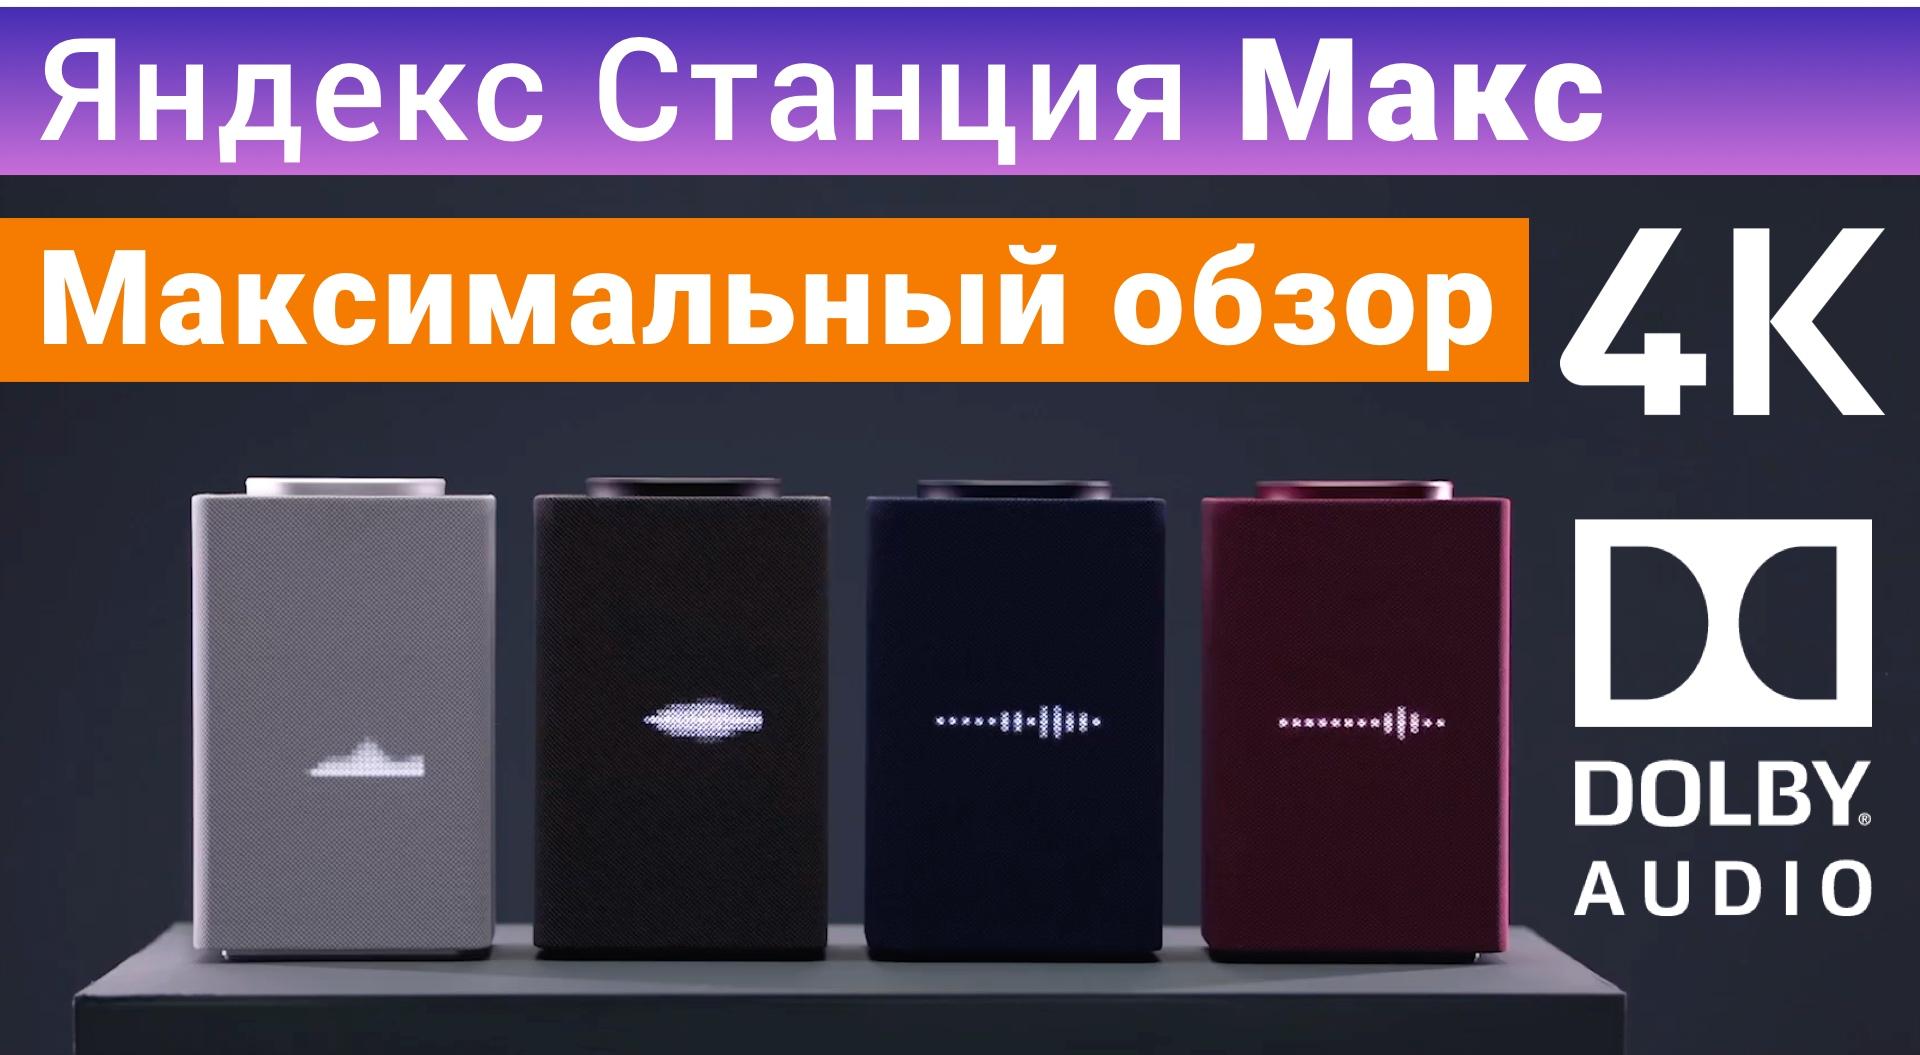 Видео обзор Яндекс Станция Макс с Алисой, 4K, Dolby Audio